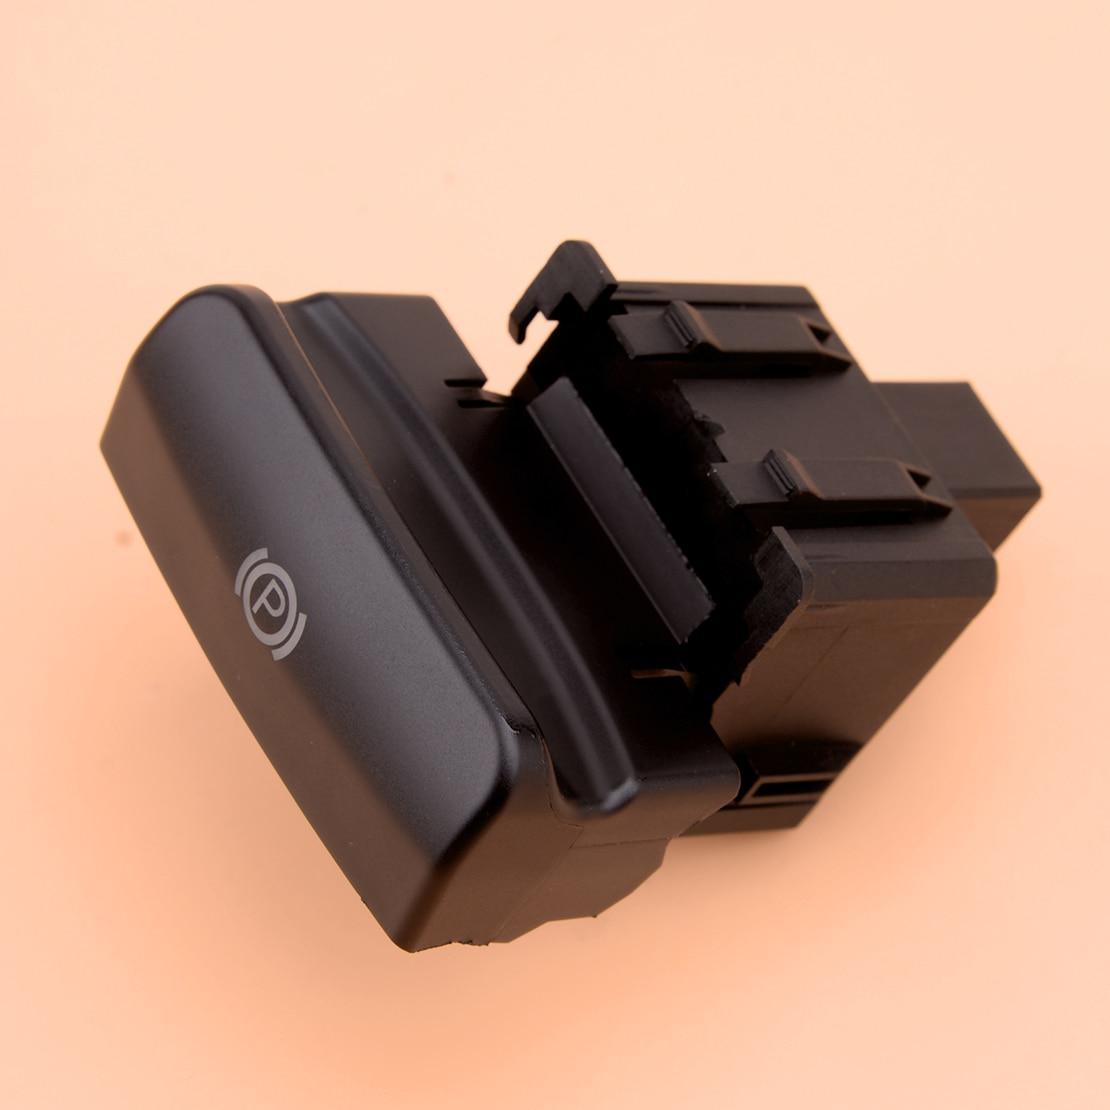 470702 Botón de interruptor de freno de mano electrónico negro mate para aparcar Citroen C4 Picasso Grand Picasso Peugeot 470703